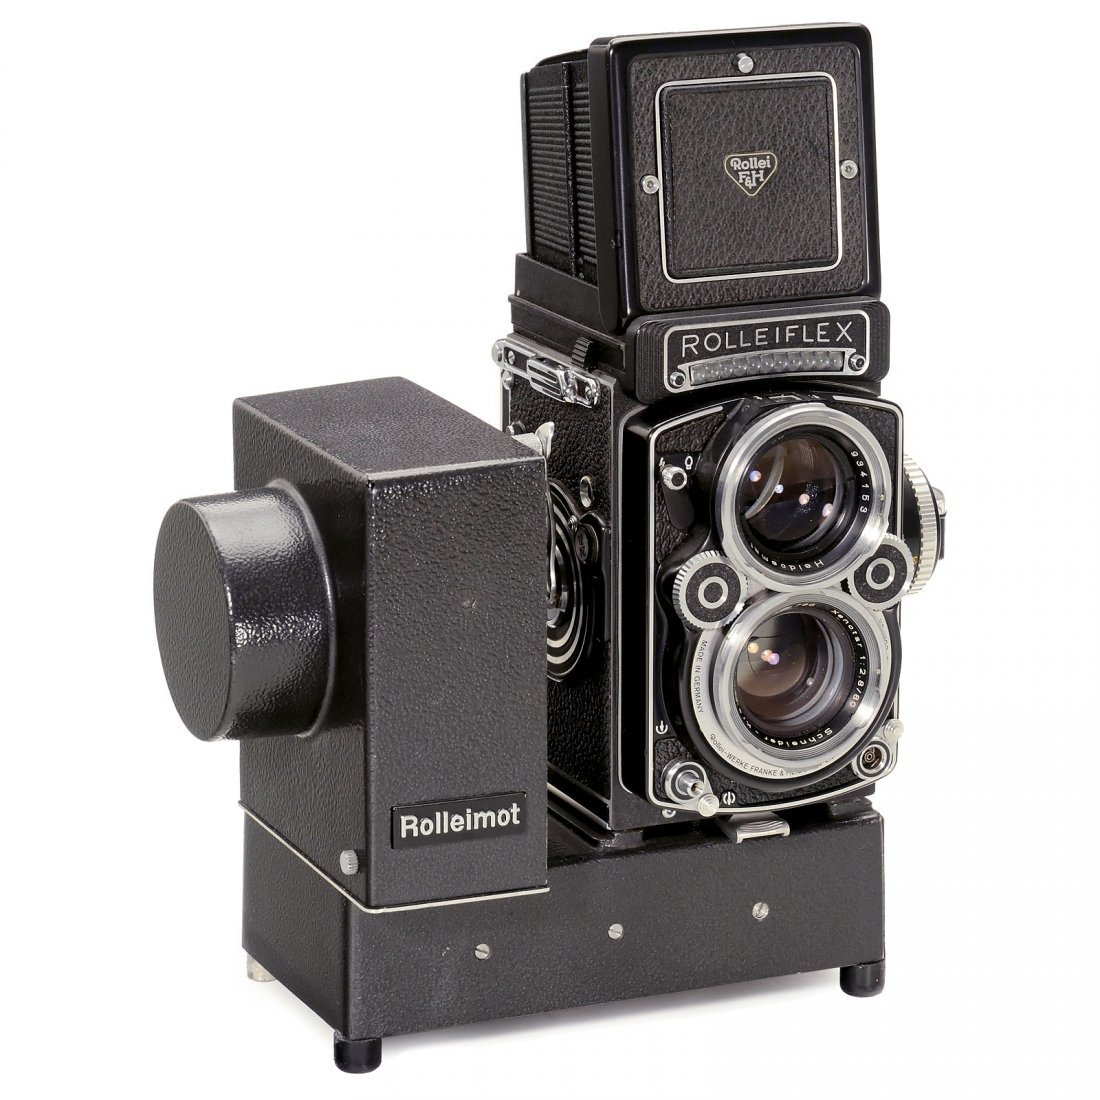 "Rolleiflex 2,8 F "" Xenotar"" with Rolleimot 1, 1973"